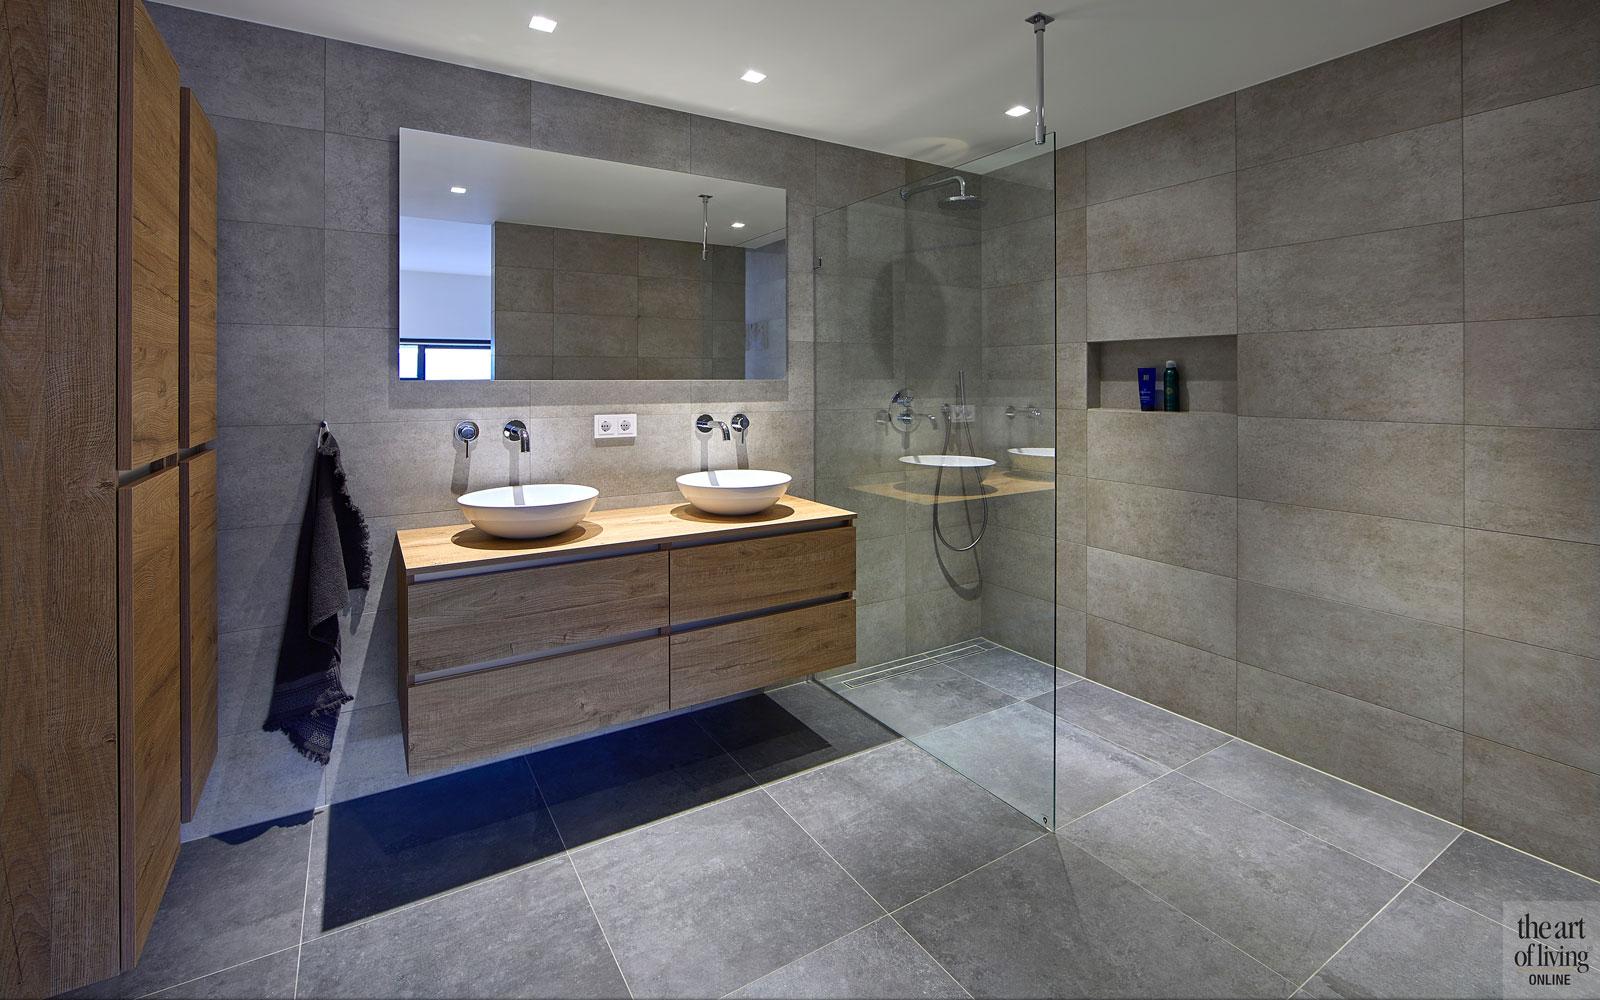 Badkamer, inloopdouche, wastafel, sanitair, tegelwand, tegelvloer, strak, moderne bungalow, Leenders Architecten en Ingenieurs